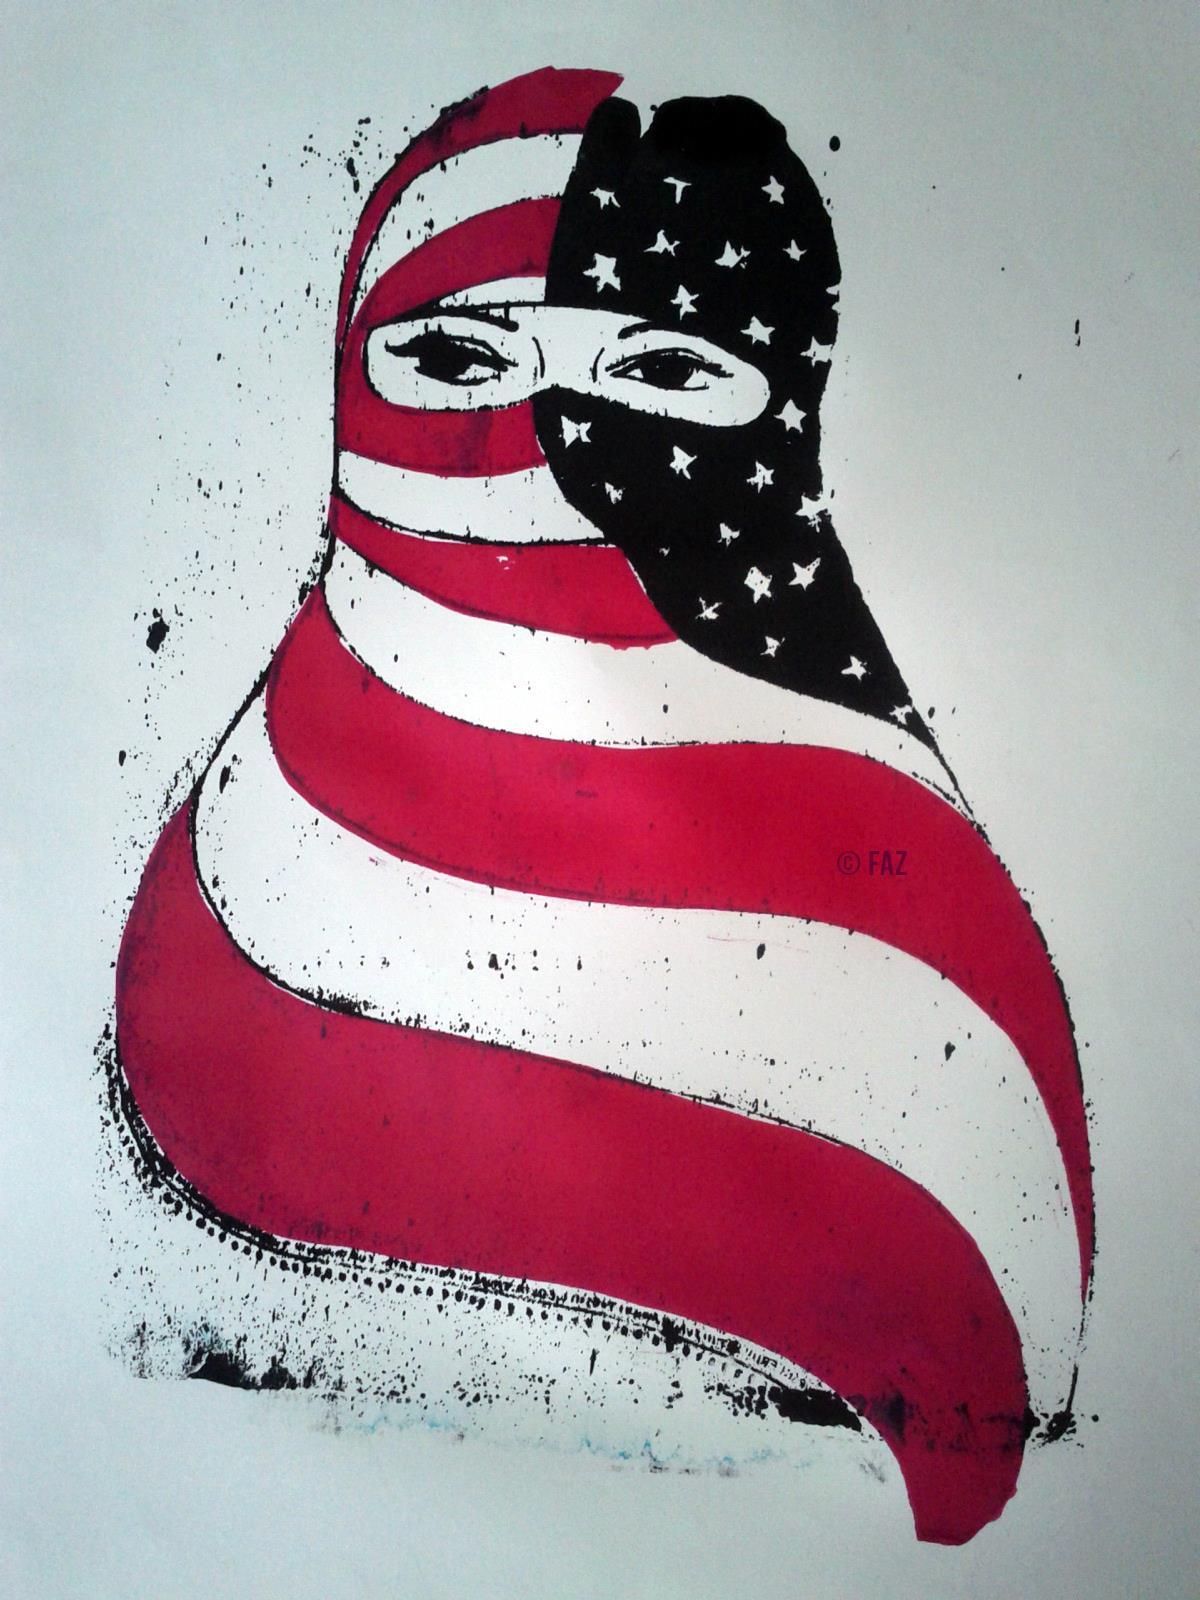 American Hijab, 2012, Serigraph, Angela Faz